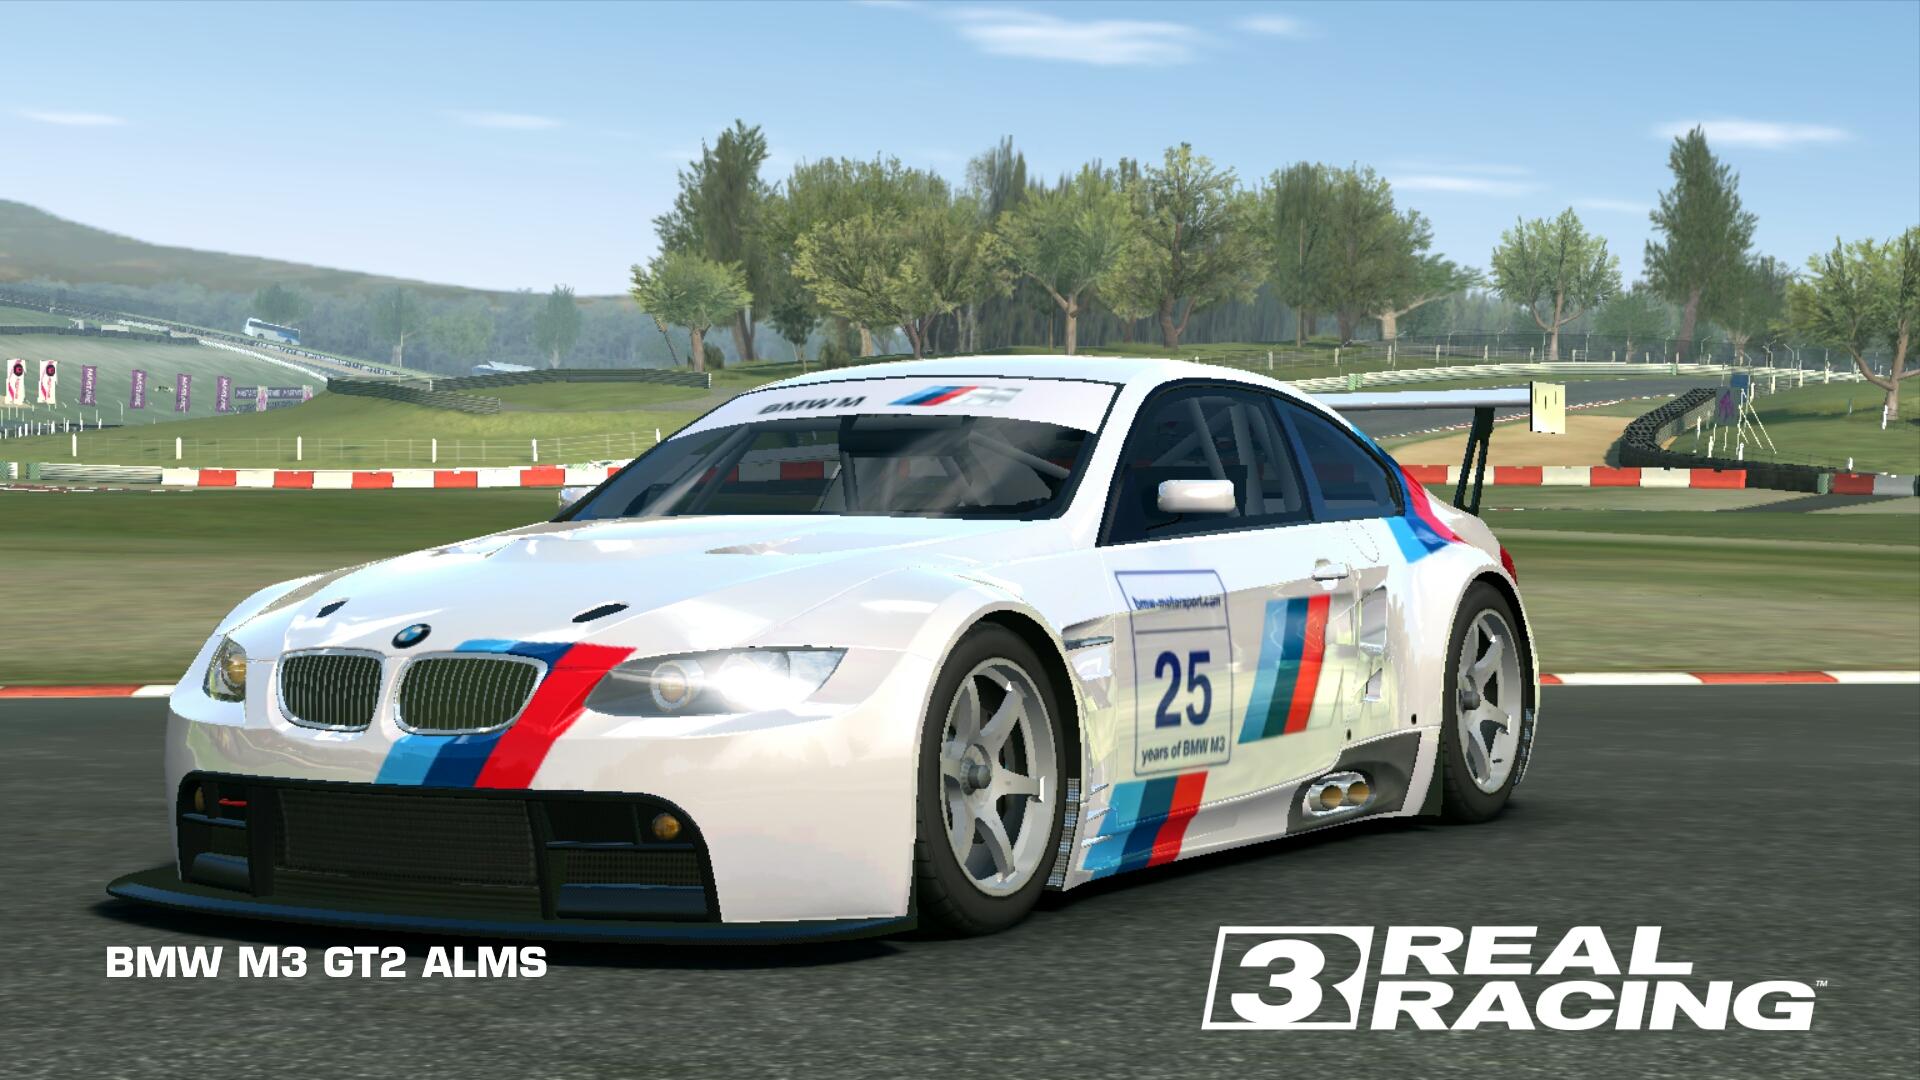 Showcase BMW M3 GT2 ALMS